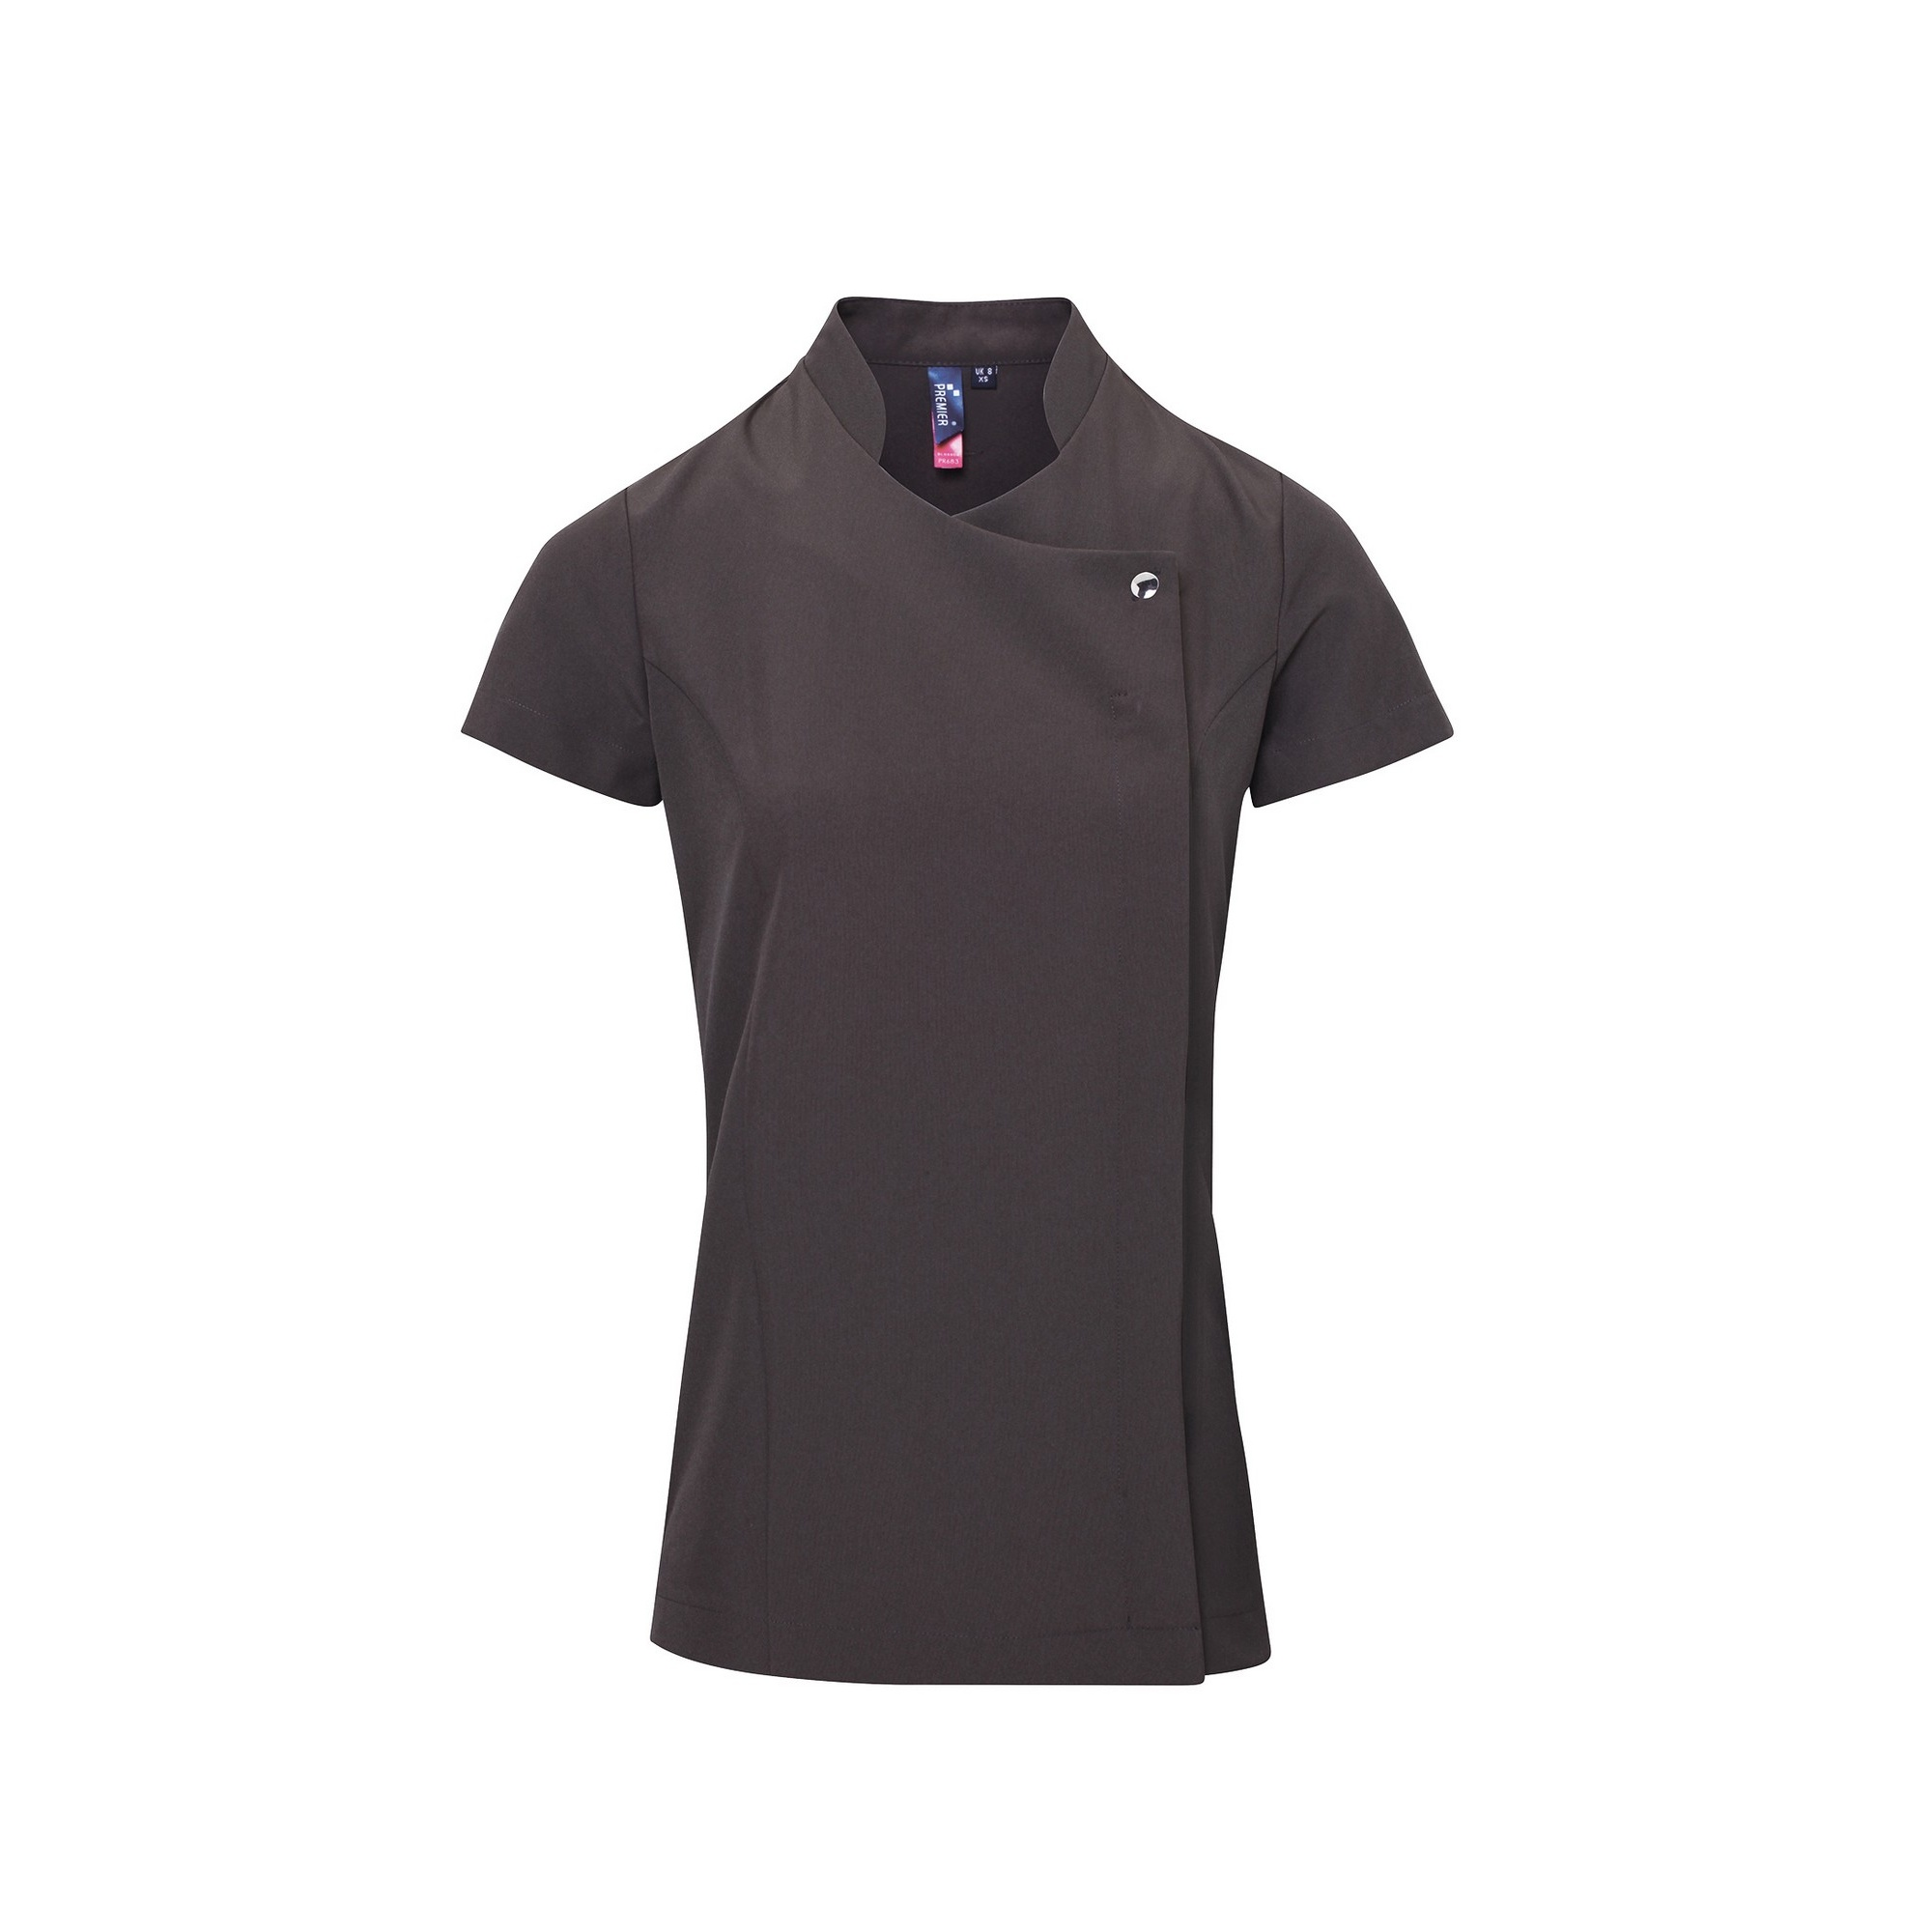 Premier Ladies/Womens *Blossom* Tunic / Health Beauty & Spa / Workwear (16) (Dark Grey)